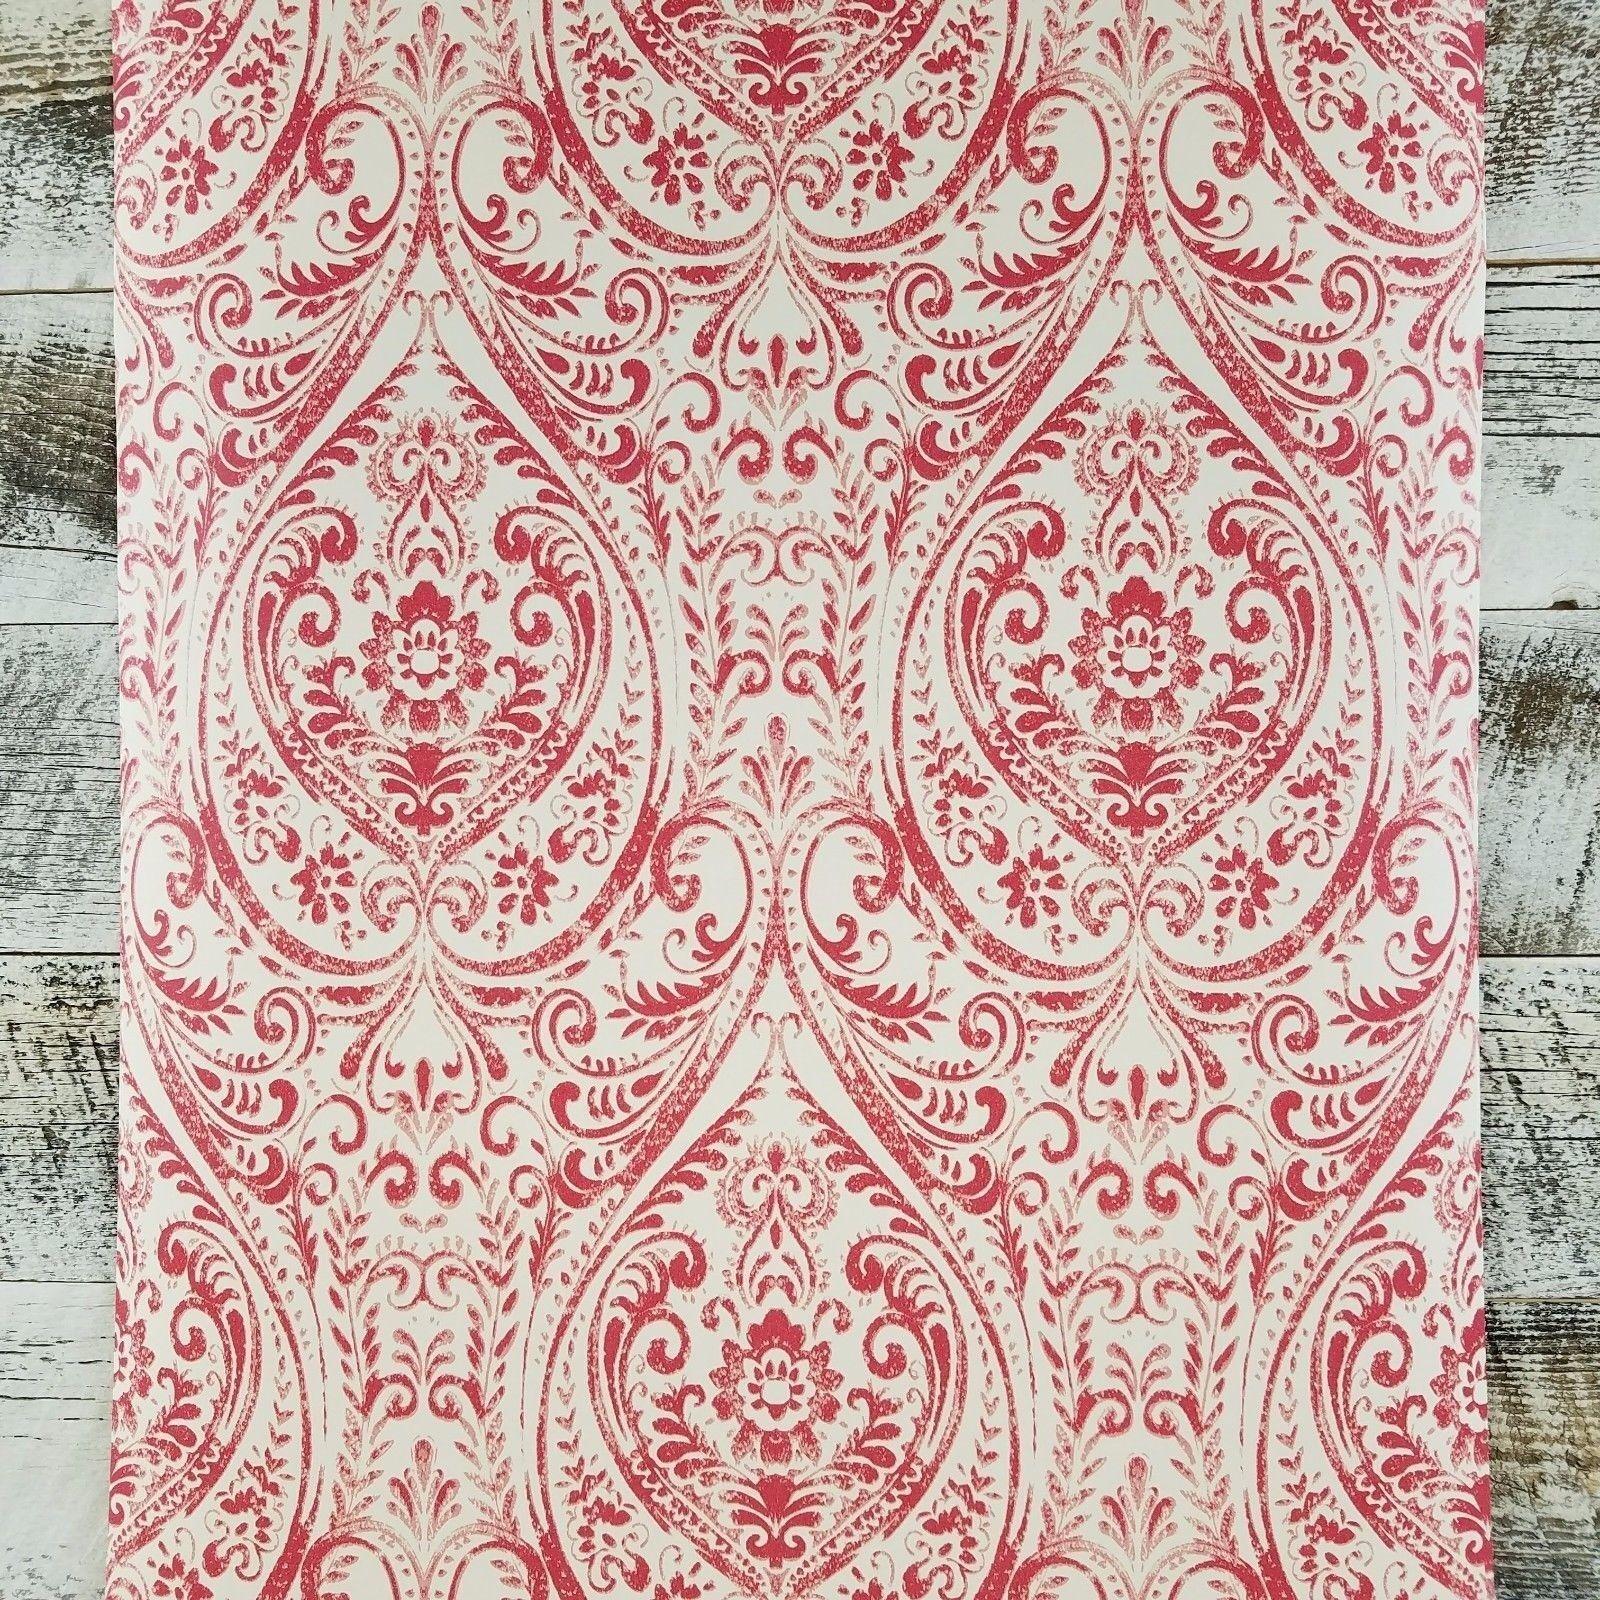 Brewster Jodhpur A Street Prints Boho Gypsy Designer Damask Albany Wallpaper DIY